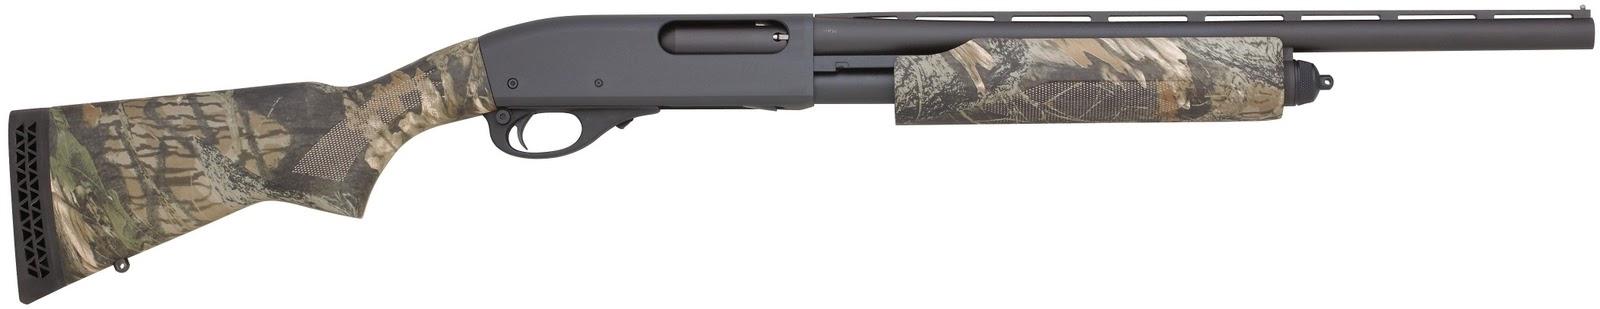 lesurvivaliste choisir une arme a feu. Black Bedroom Furniture Sets. Home Design Ideas